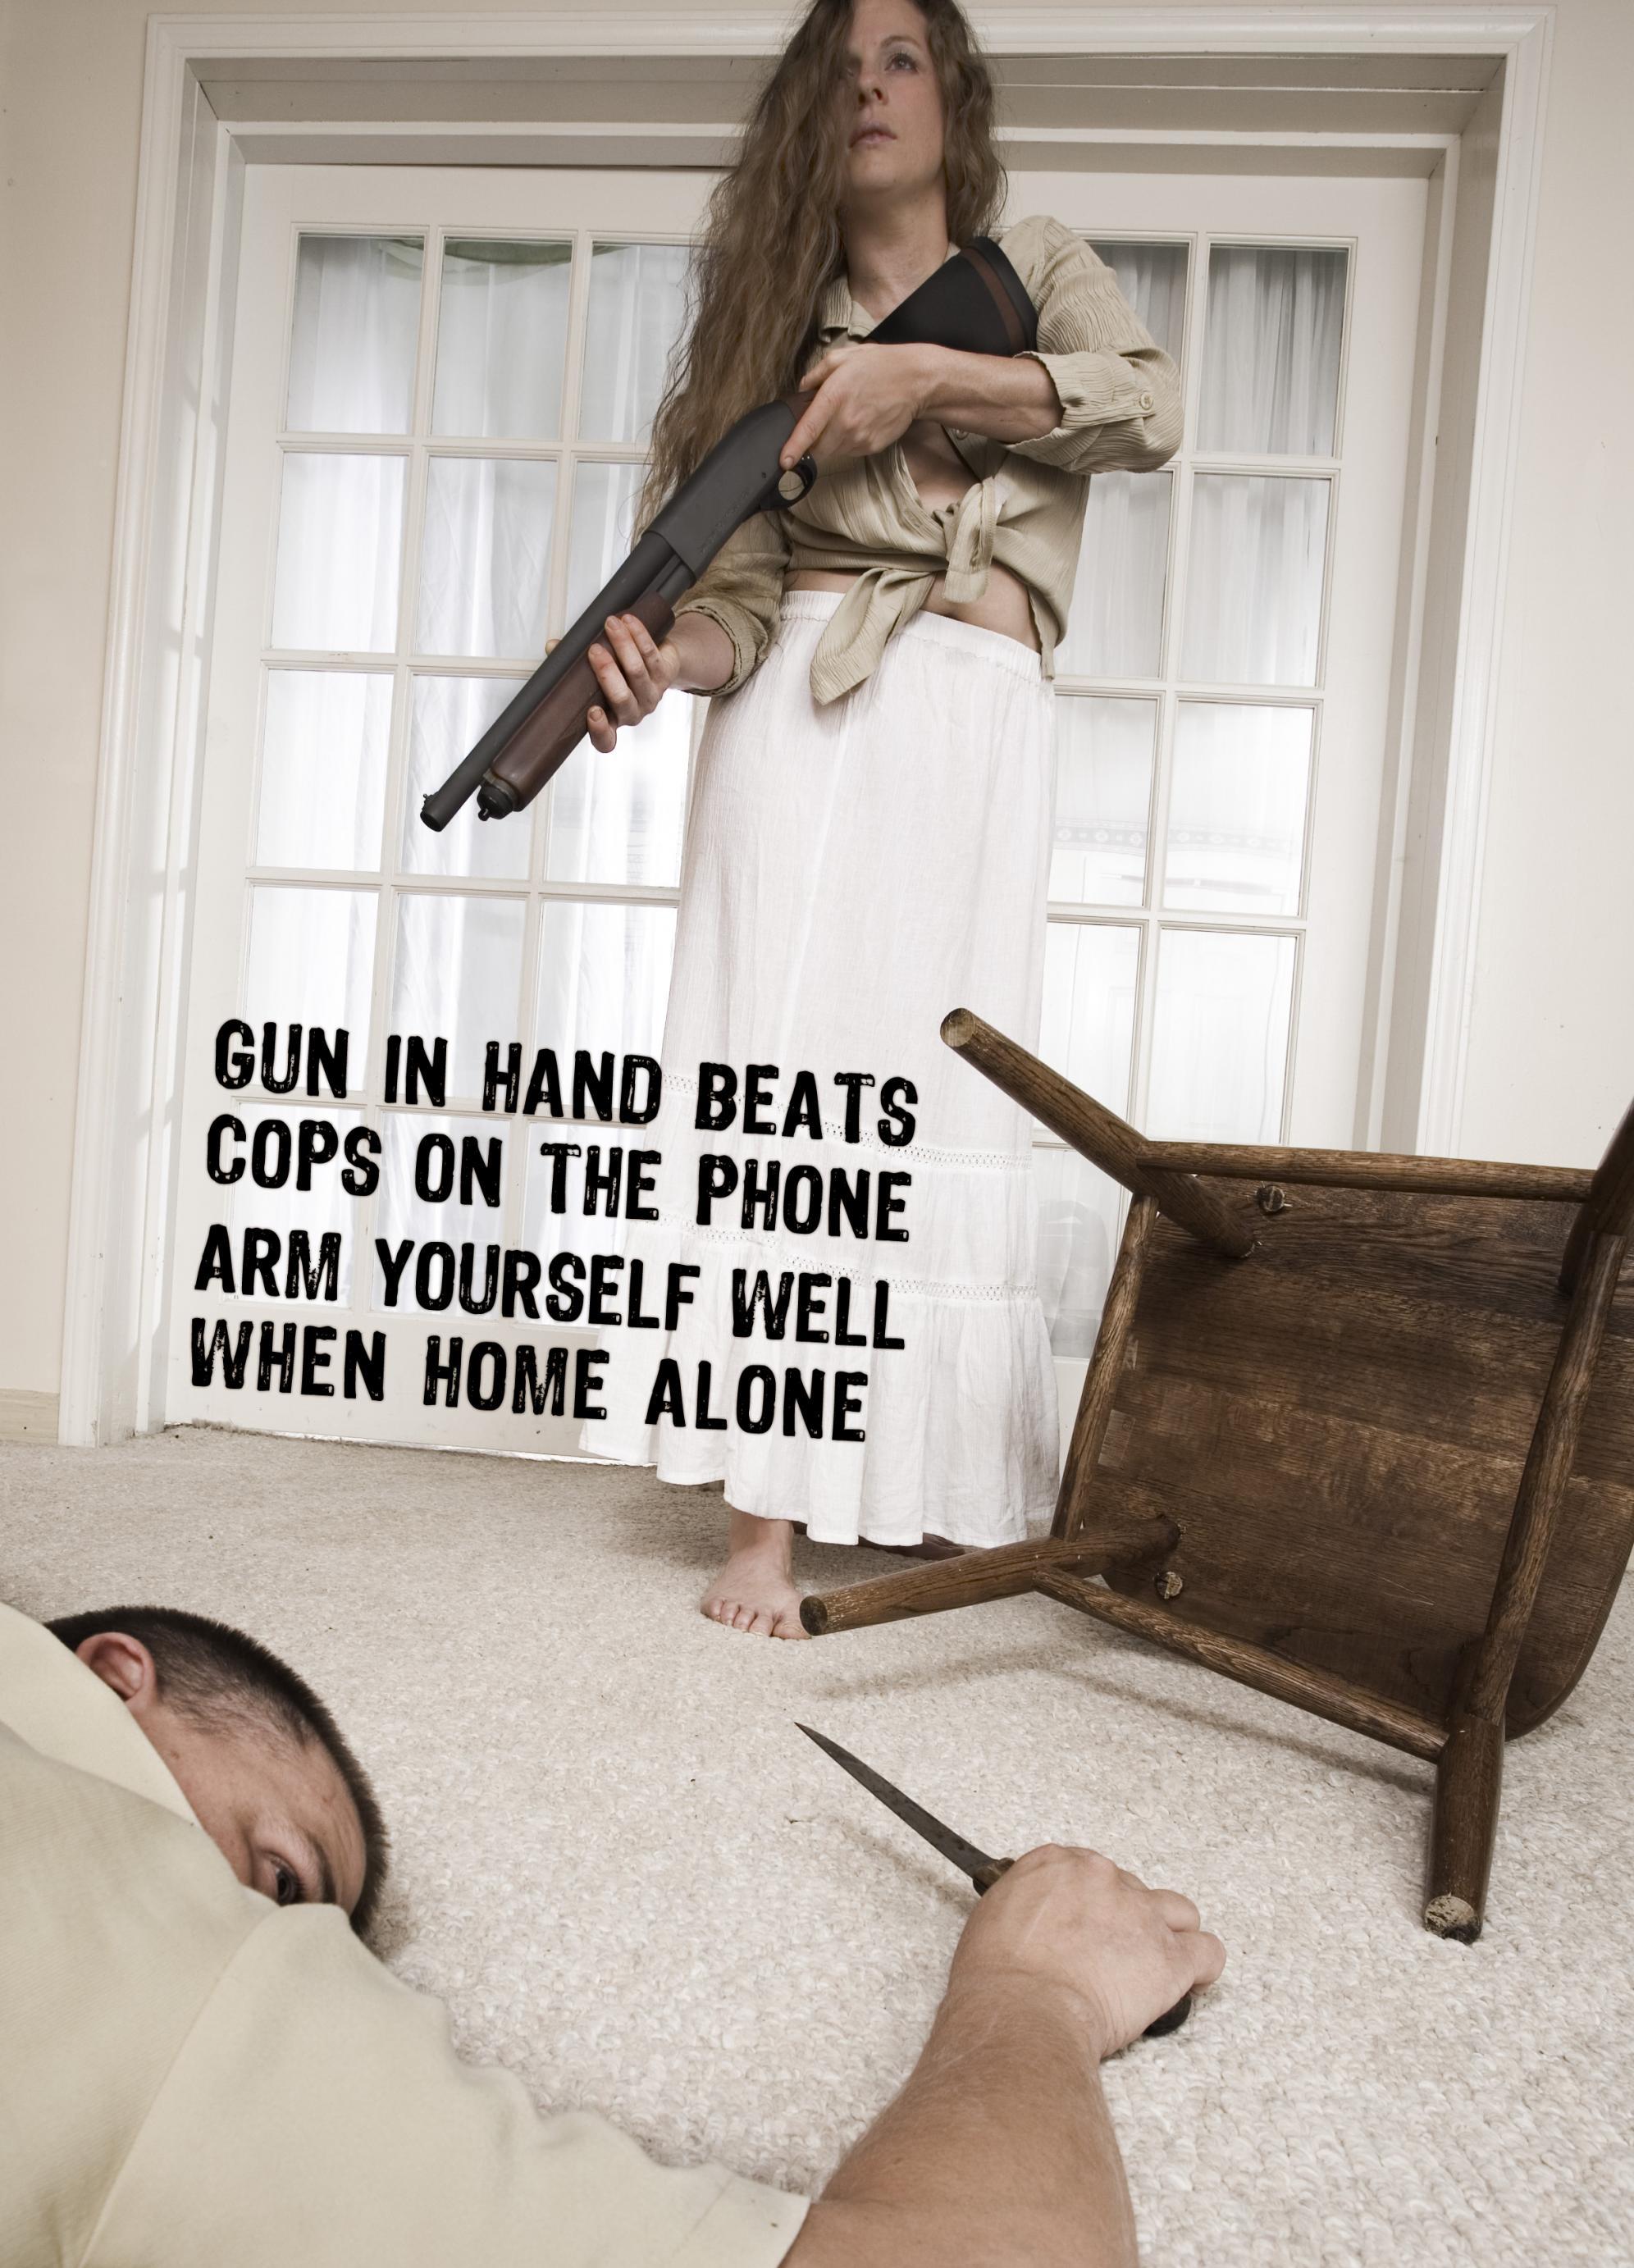 Pro-Gun, Pro-Defense Saying and Pictures-20gun-20in-20hand.jpg